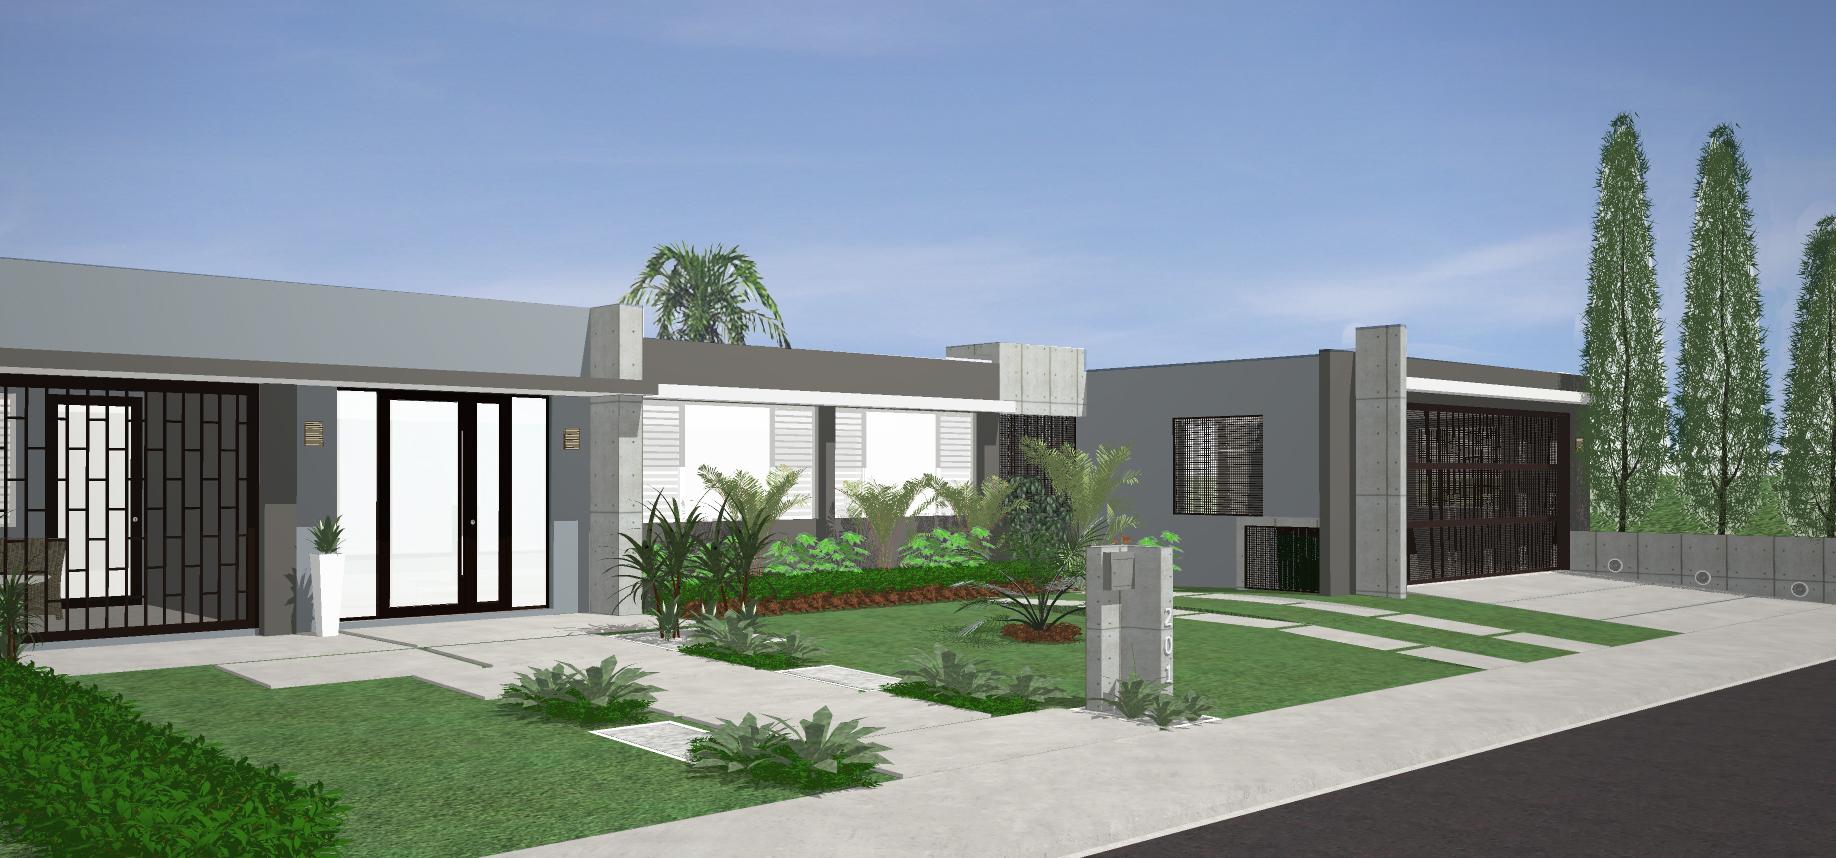 Diseño de Fachada: Residencia de Juan Gómez